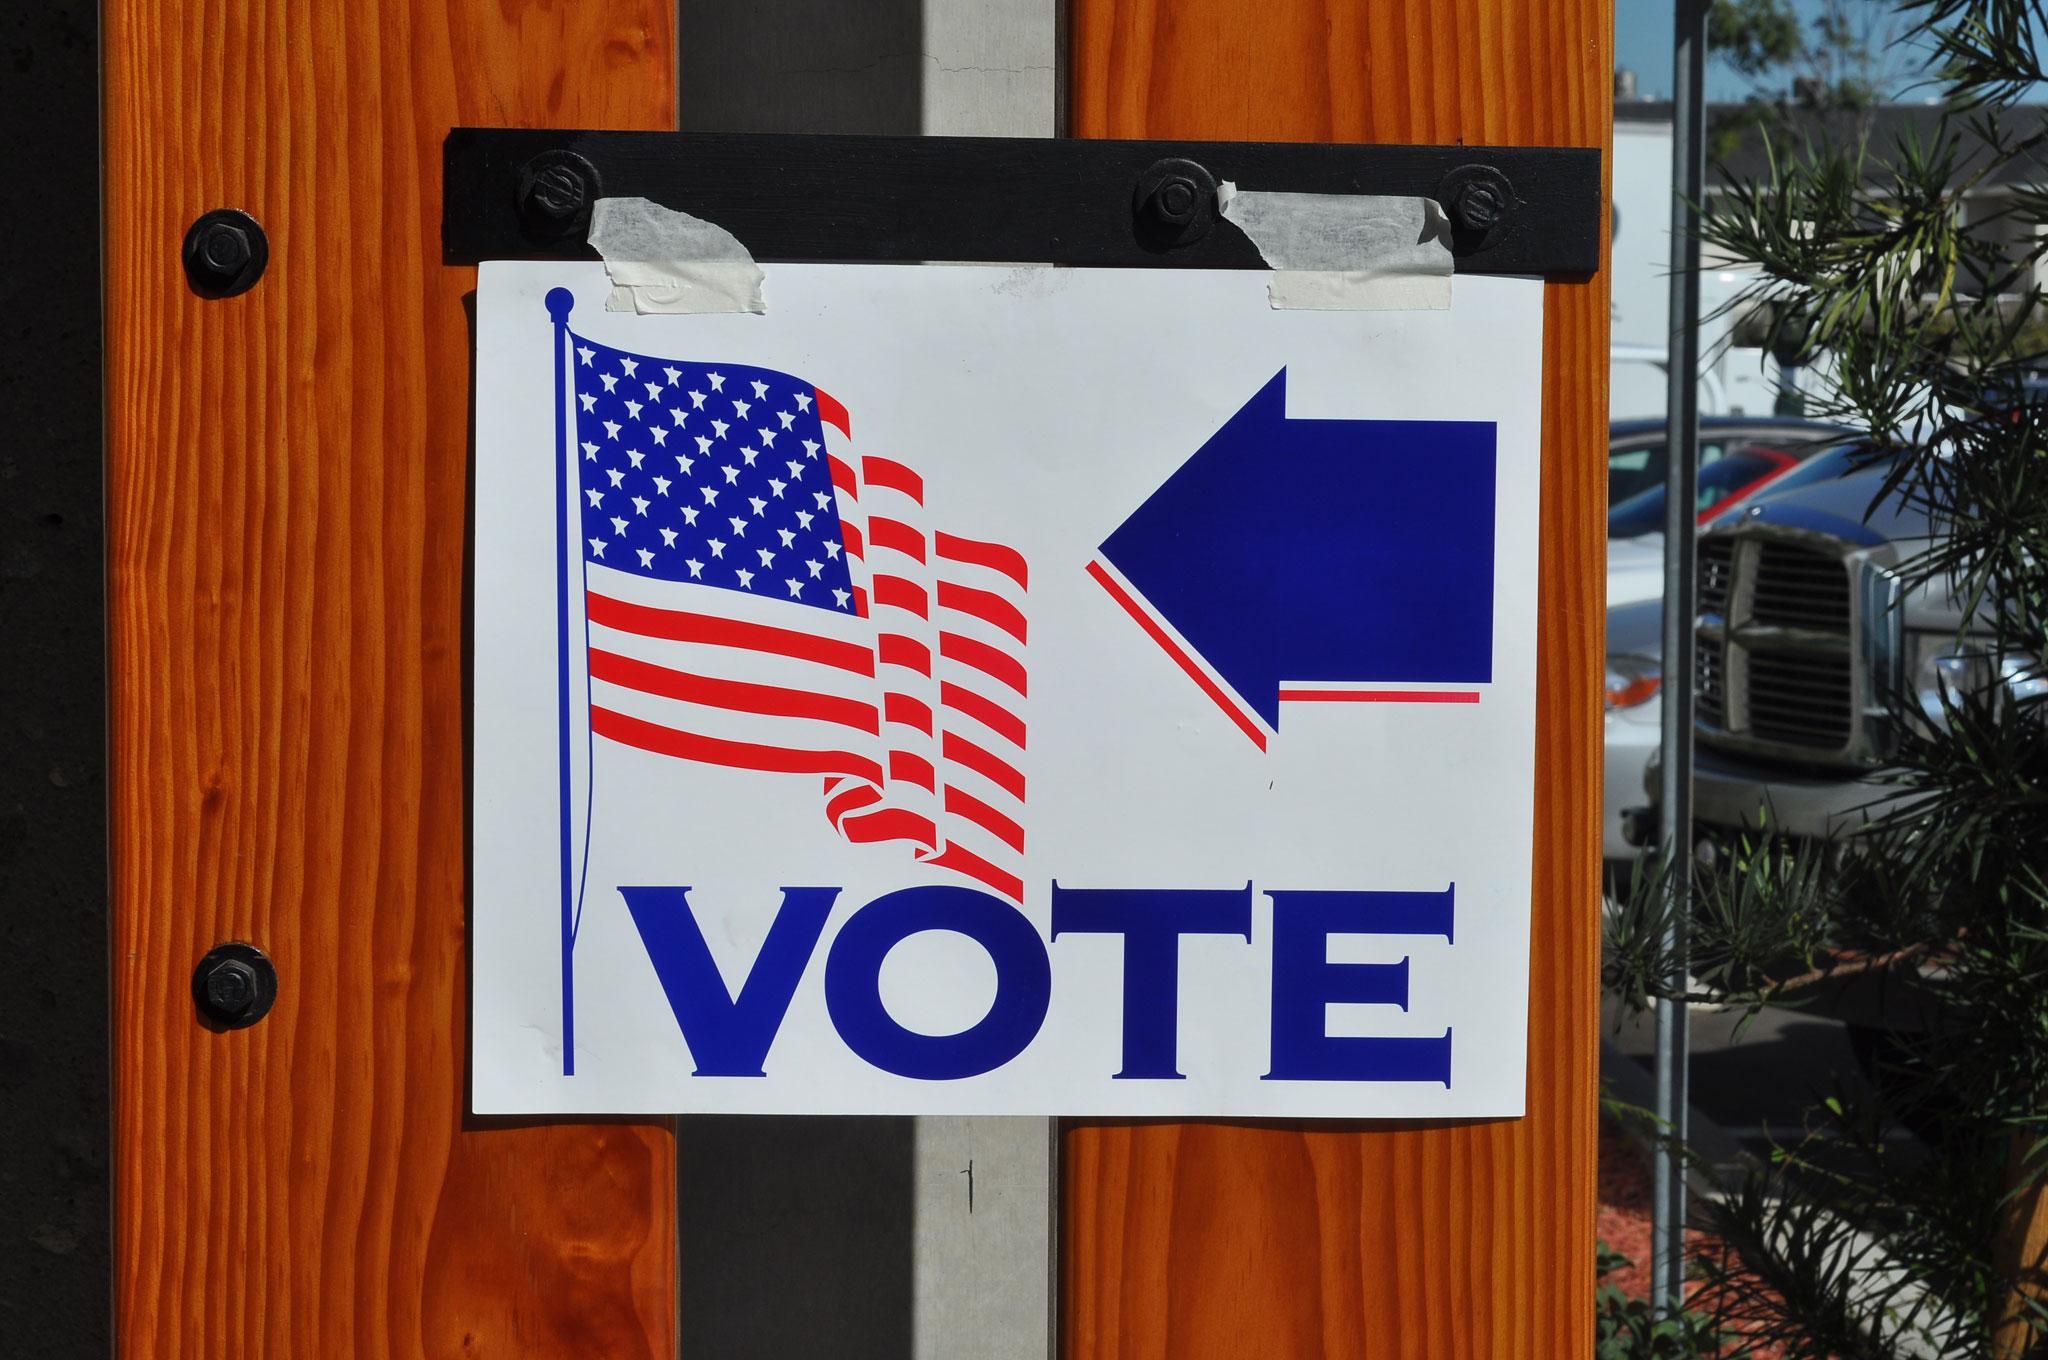 Voting_United_States_R